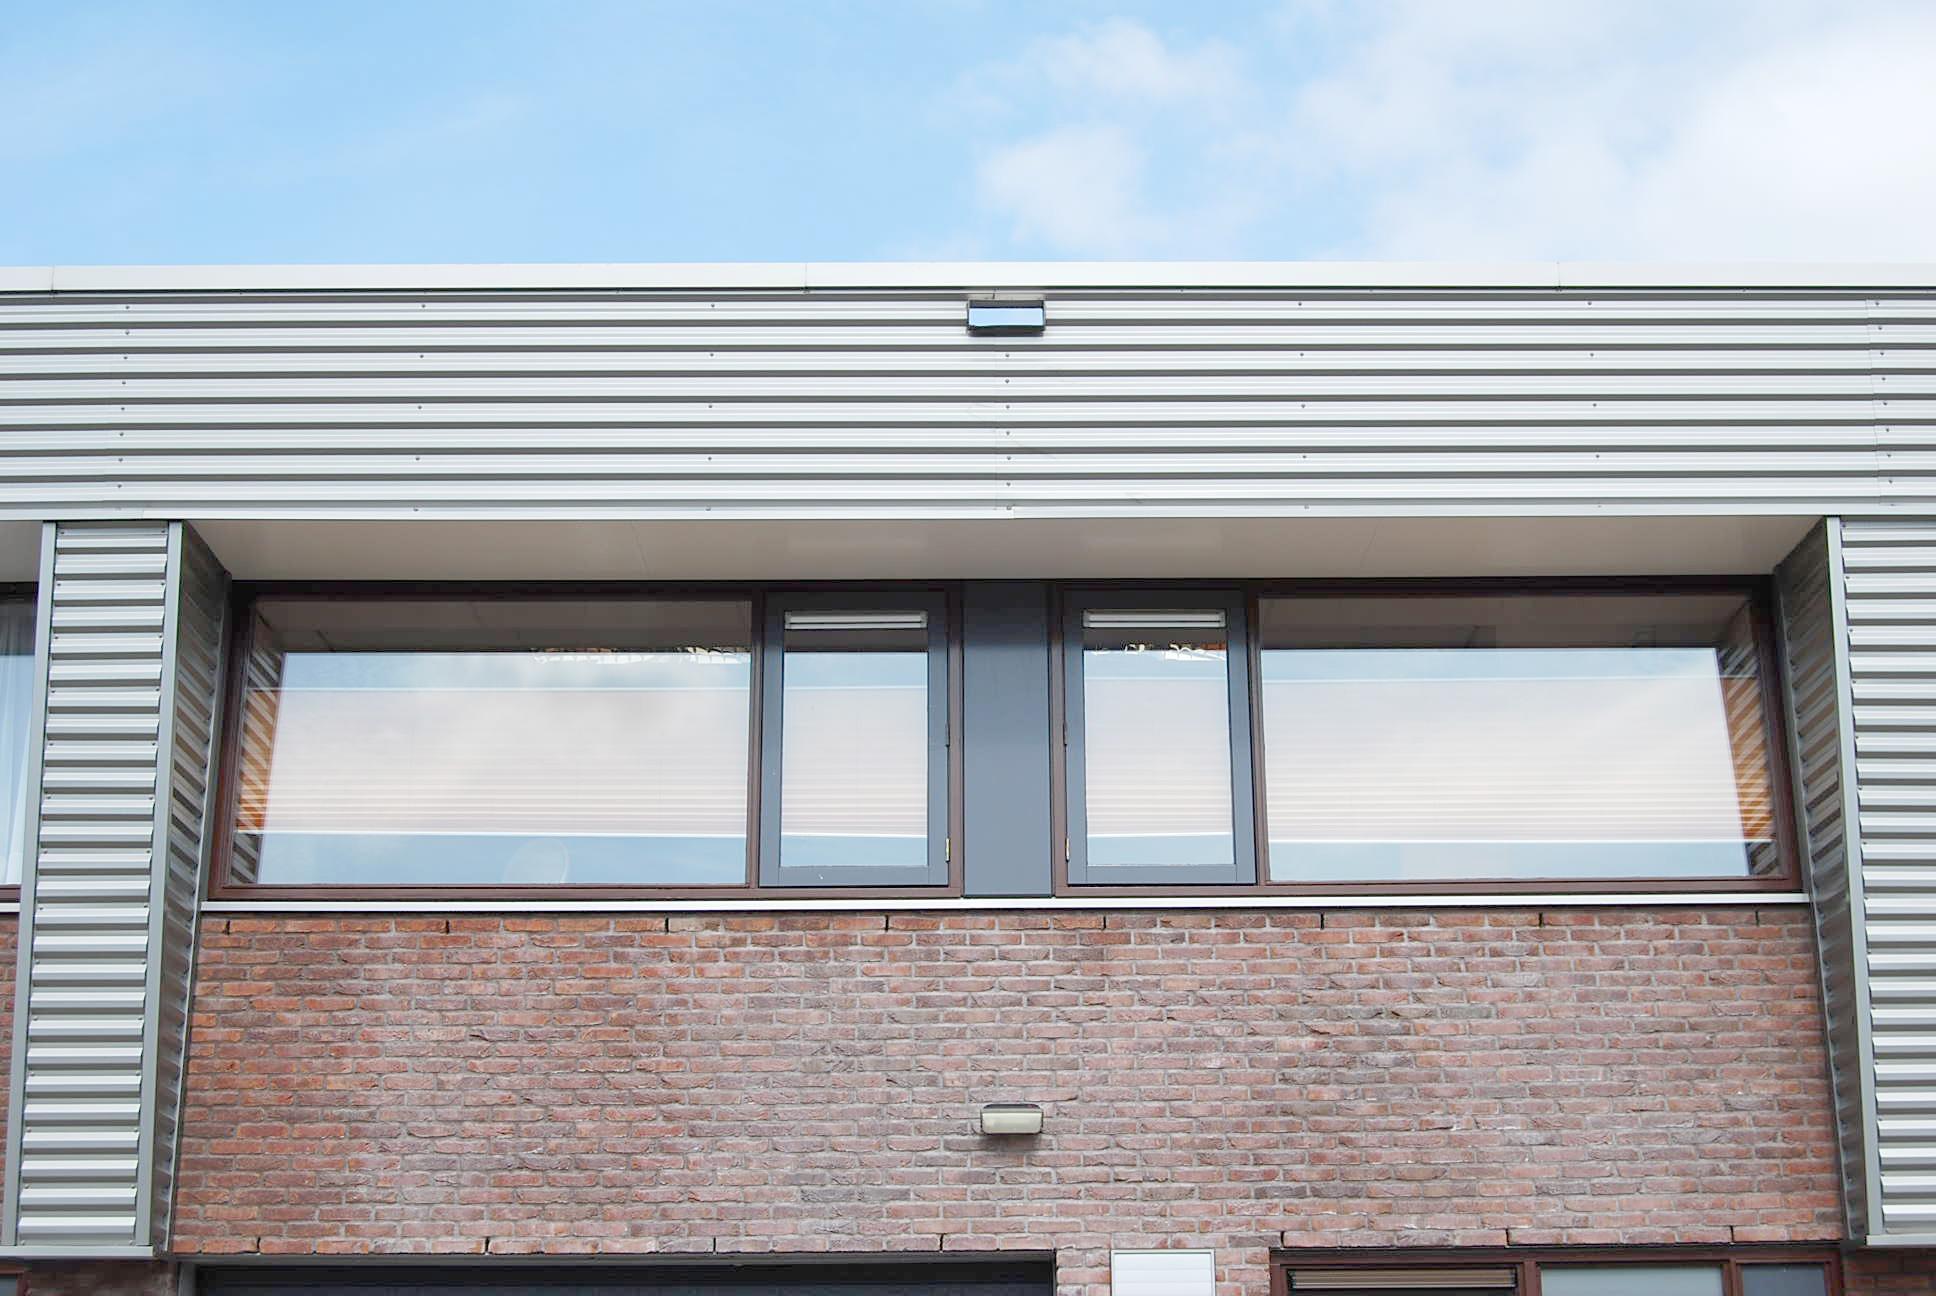 Kantoorruimte Nieuw-Vennep Lireweg 86